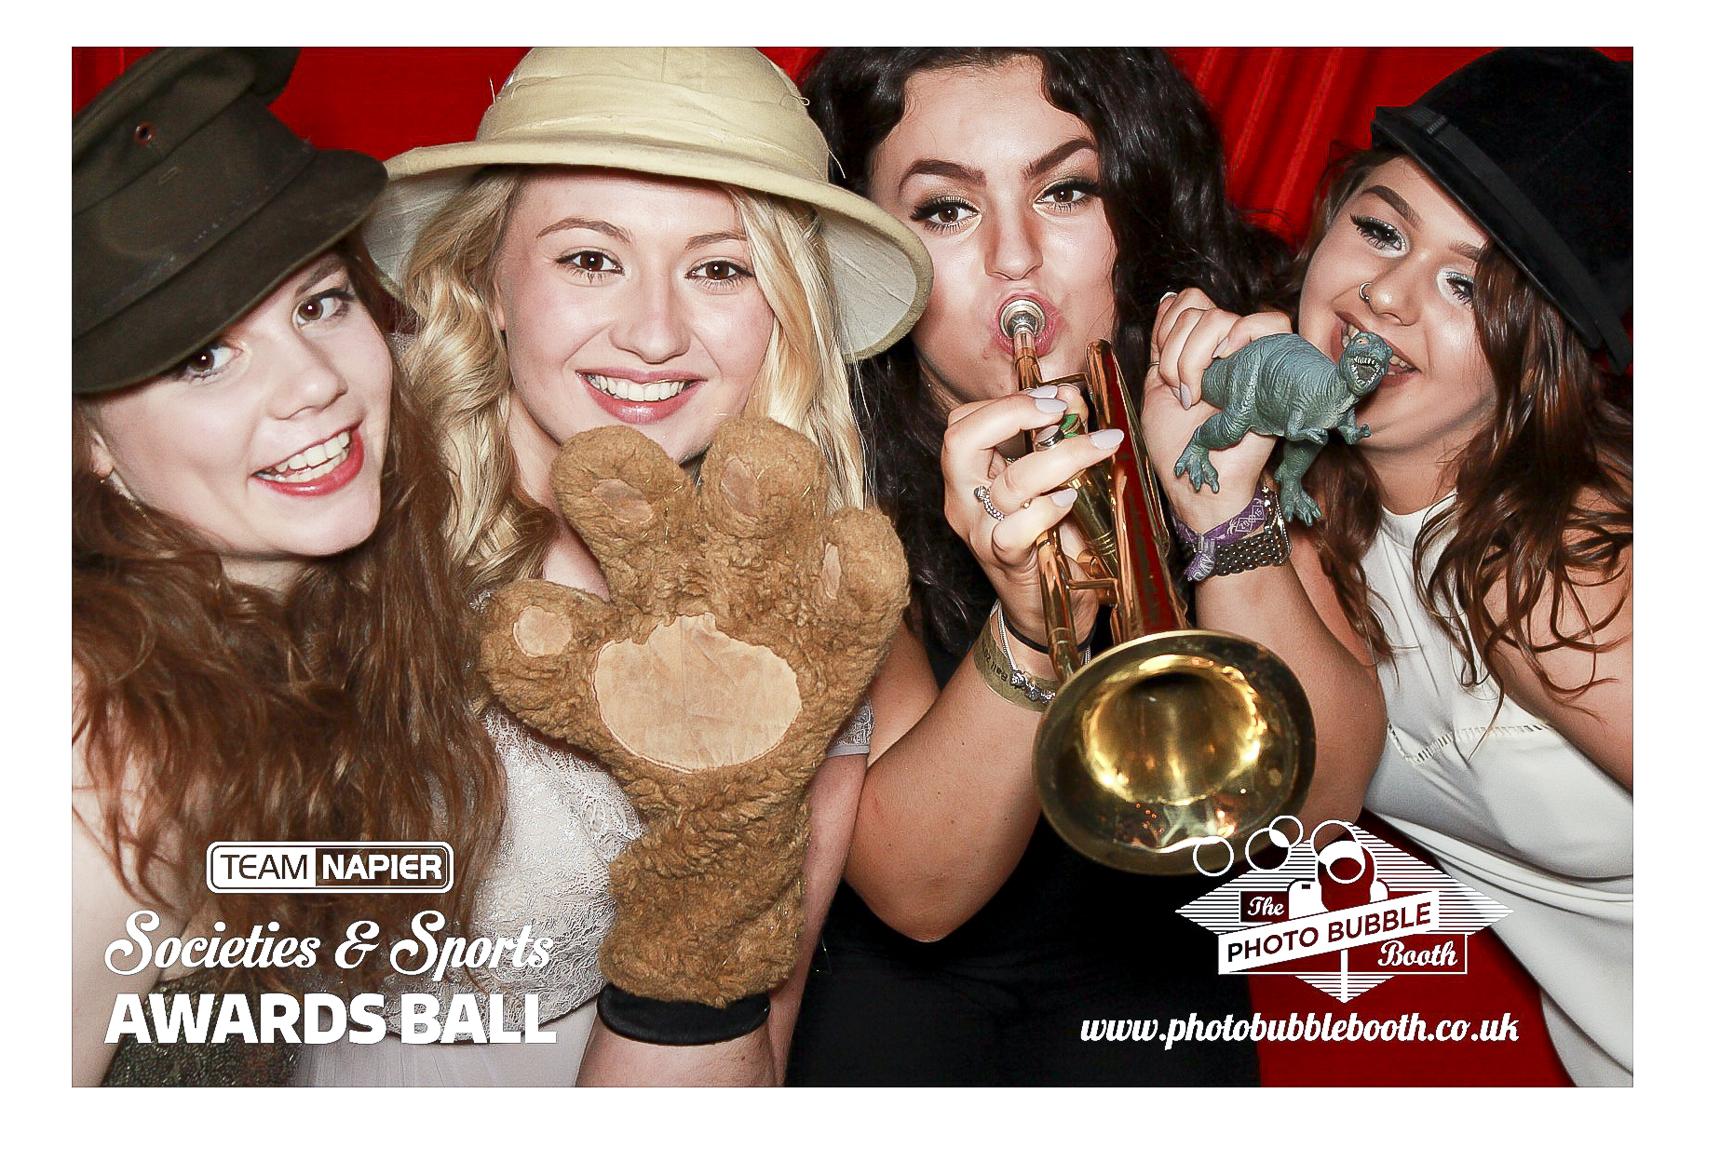 Napier Societies & Sports Awards_1.JPG